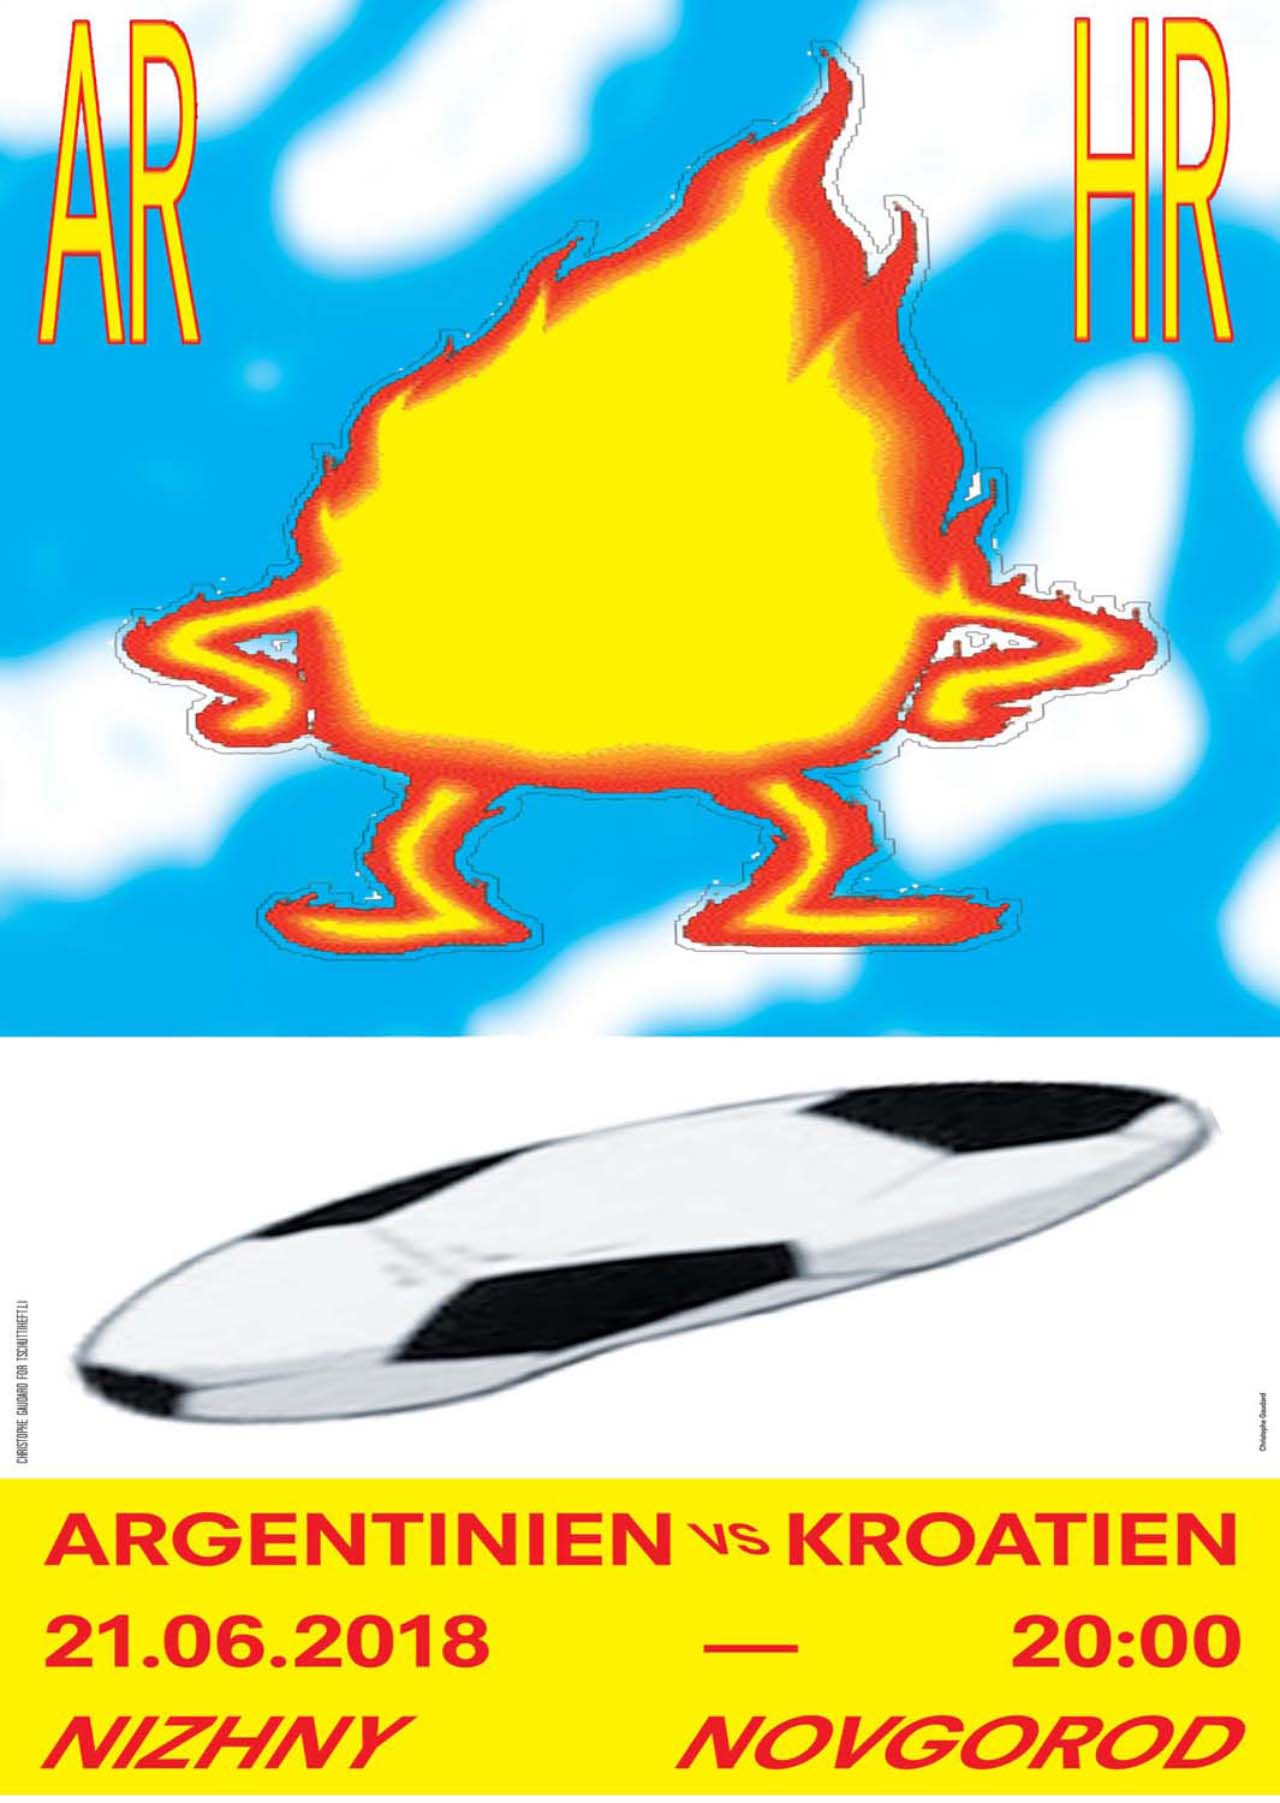 Tschutti Heftli Matchplakat Argentinien Kroatien